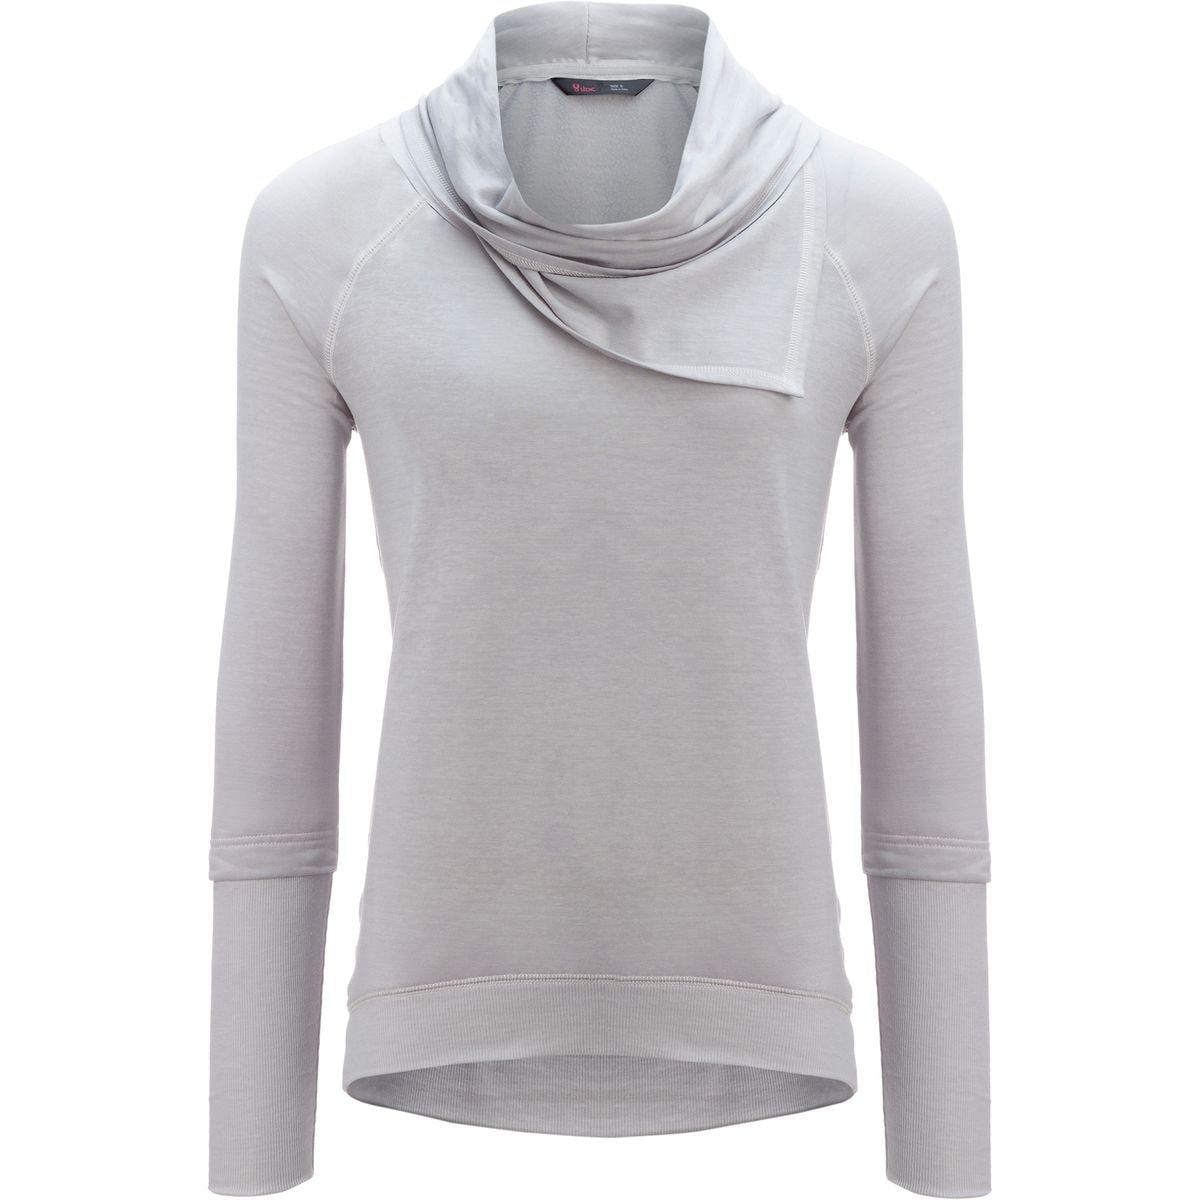 Stoic Handkerchief Pullover Sweatshirt - Women